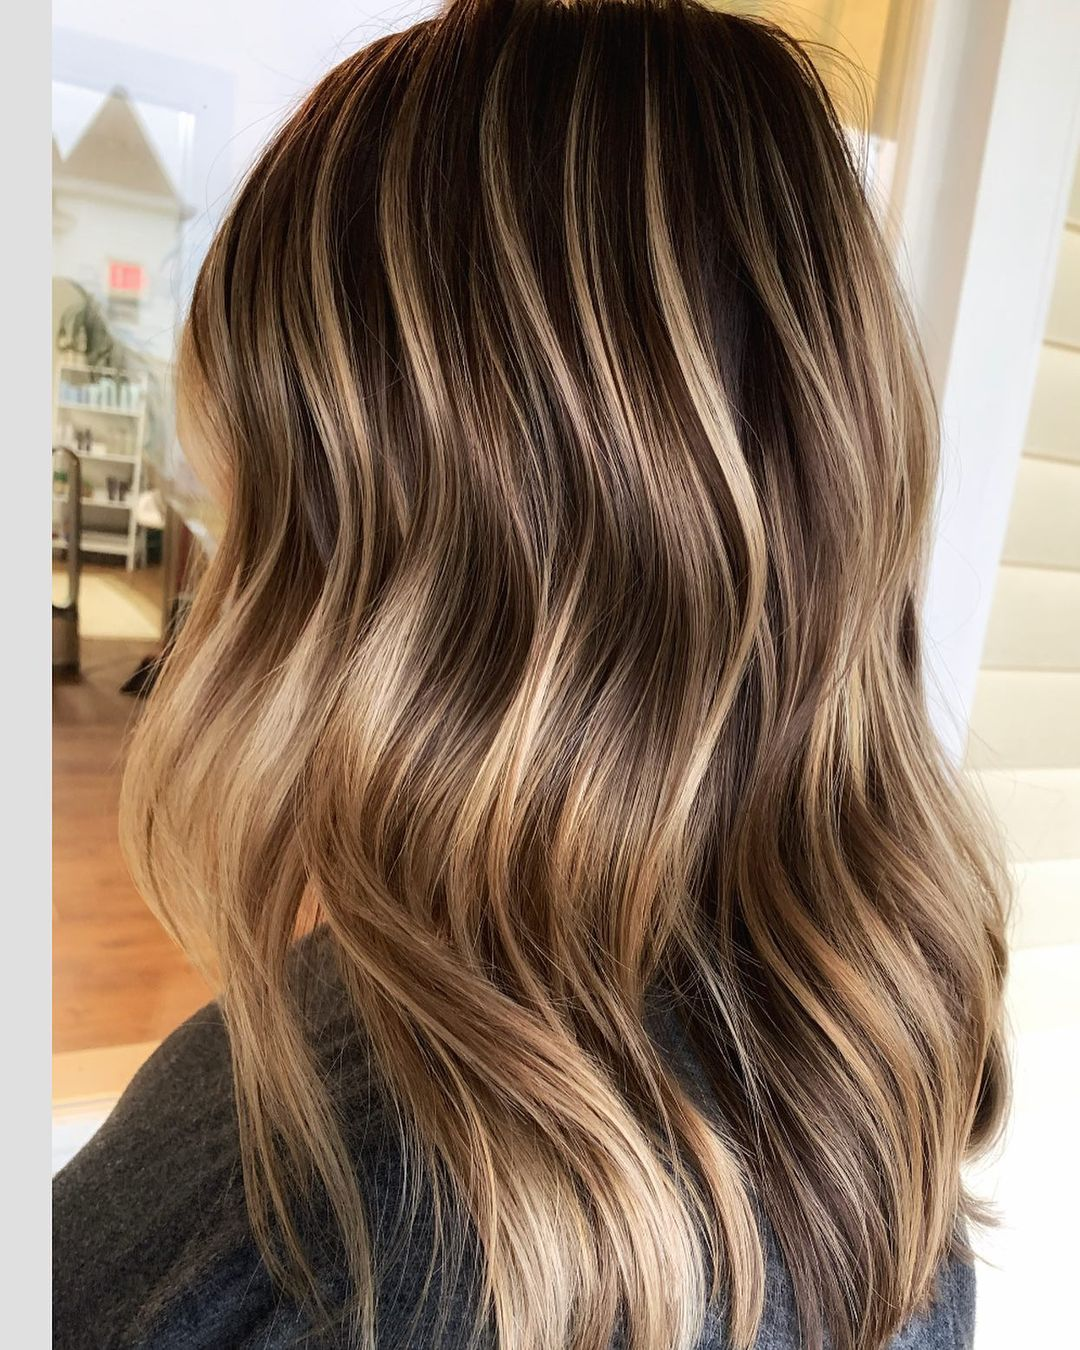 12 Popular Brown Balayage Hair Colors Trending in 12